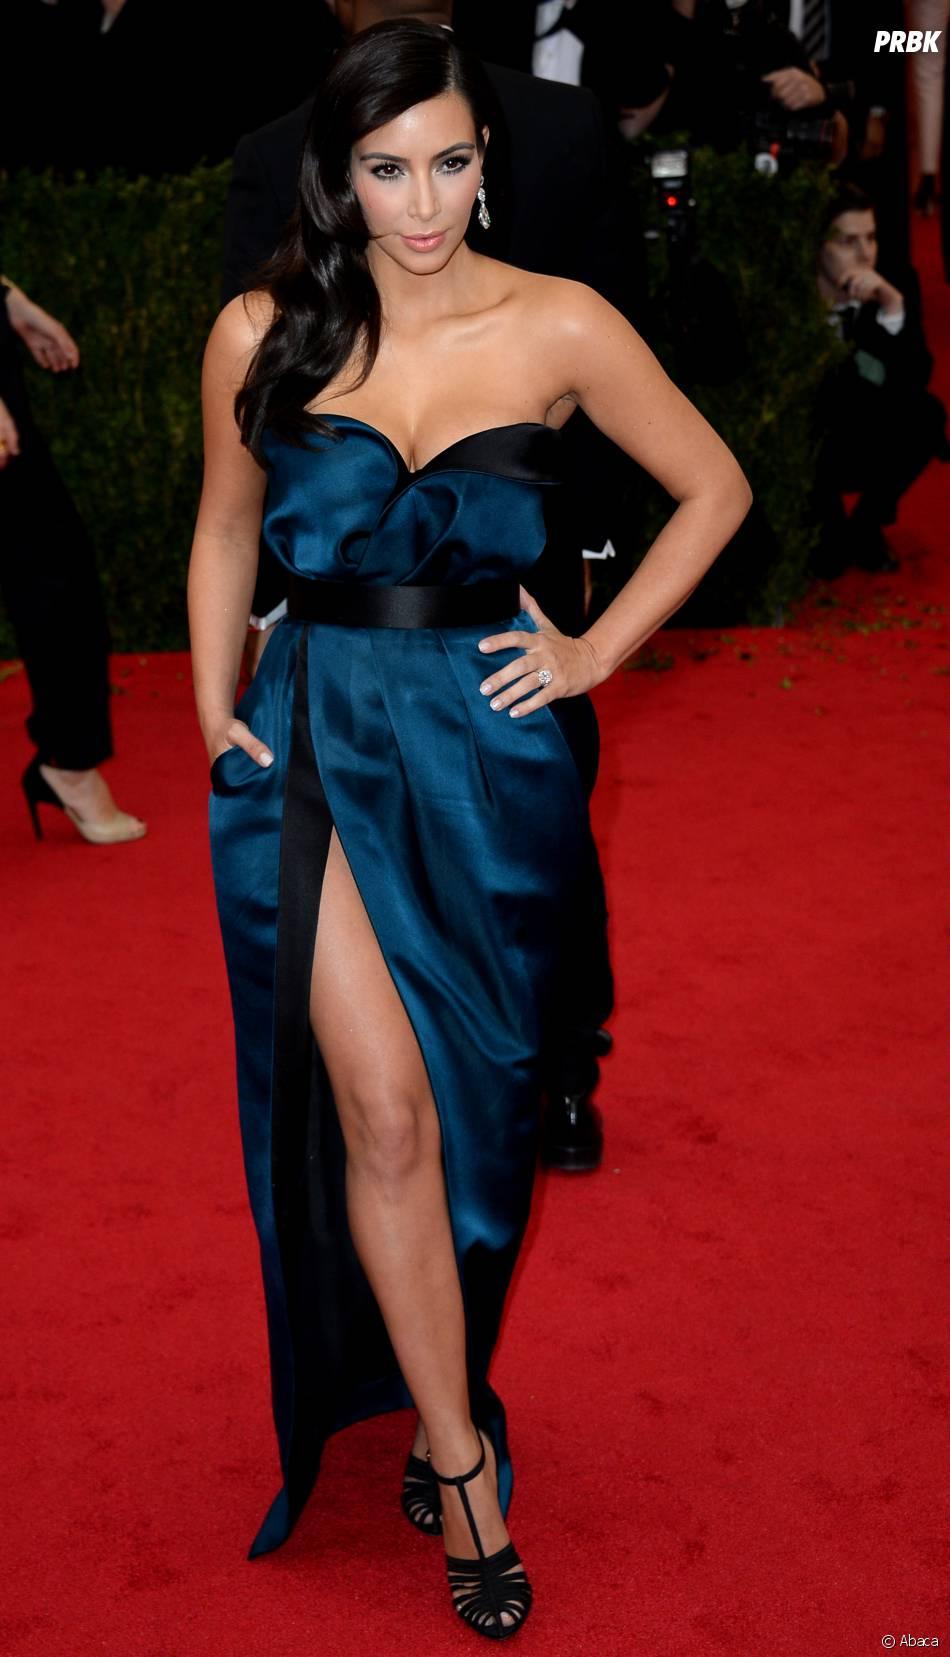 Kim Kardashian au MET Gala à New York le 5 mai 2014